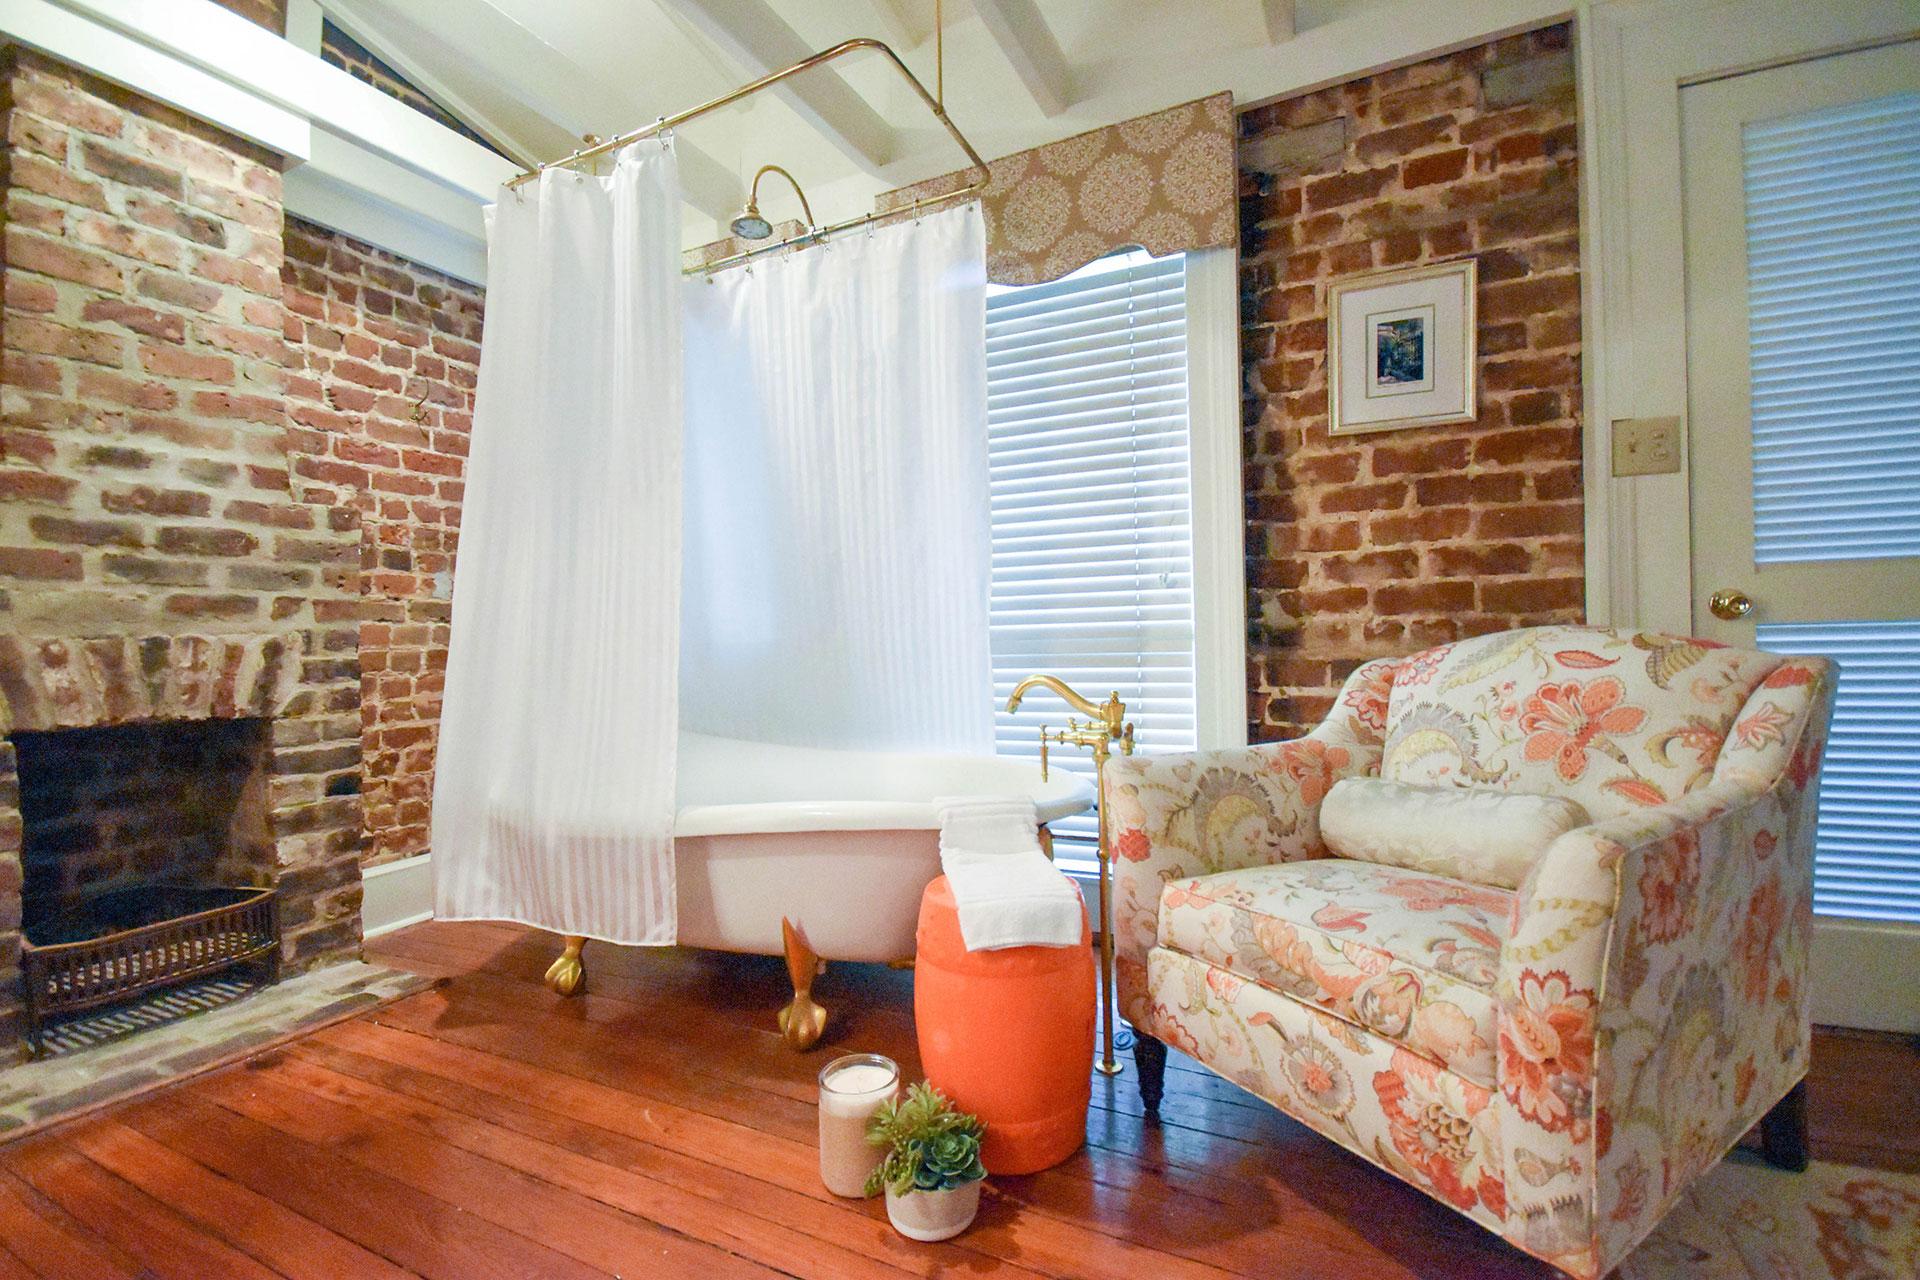 shower curtain liner over clawfoot bathtub in luxury historic inn